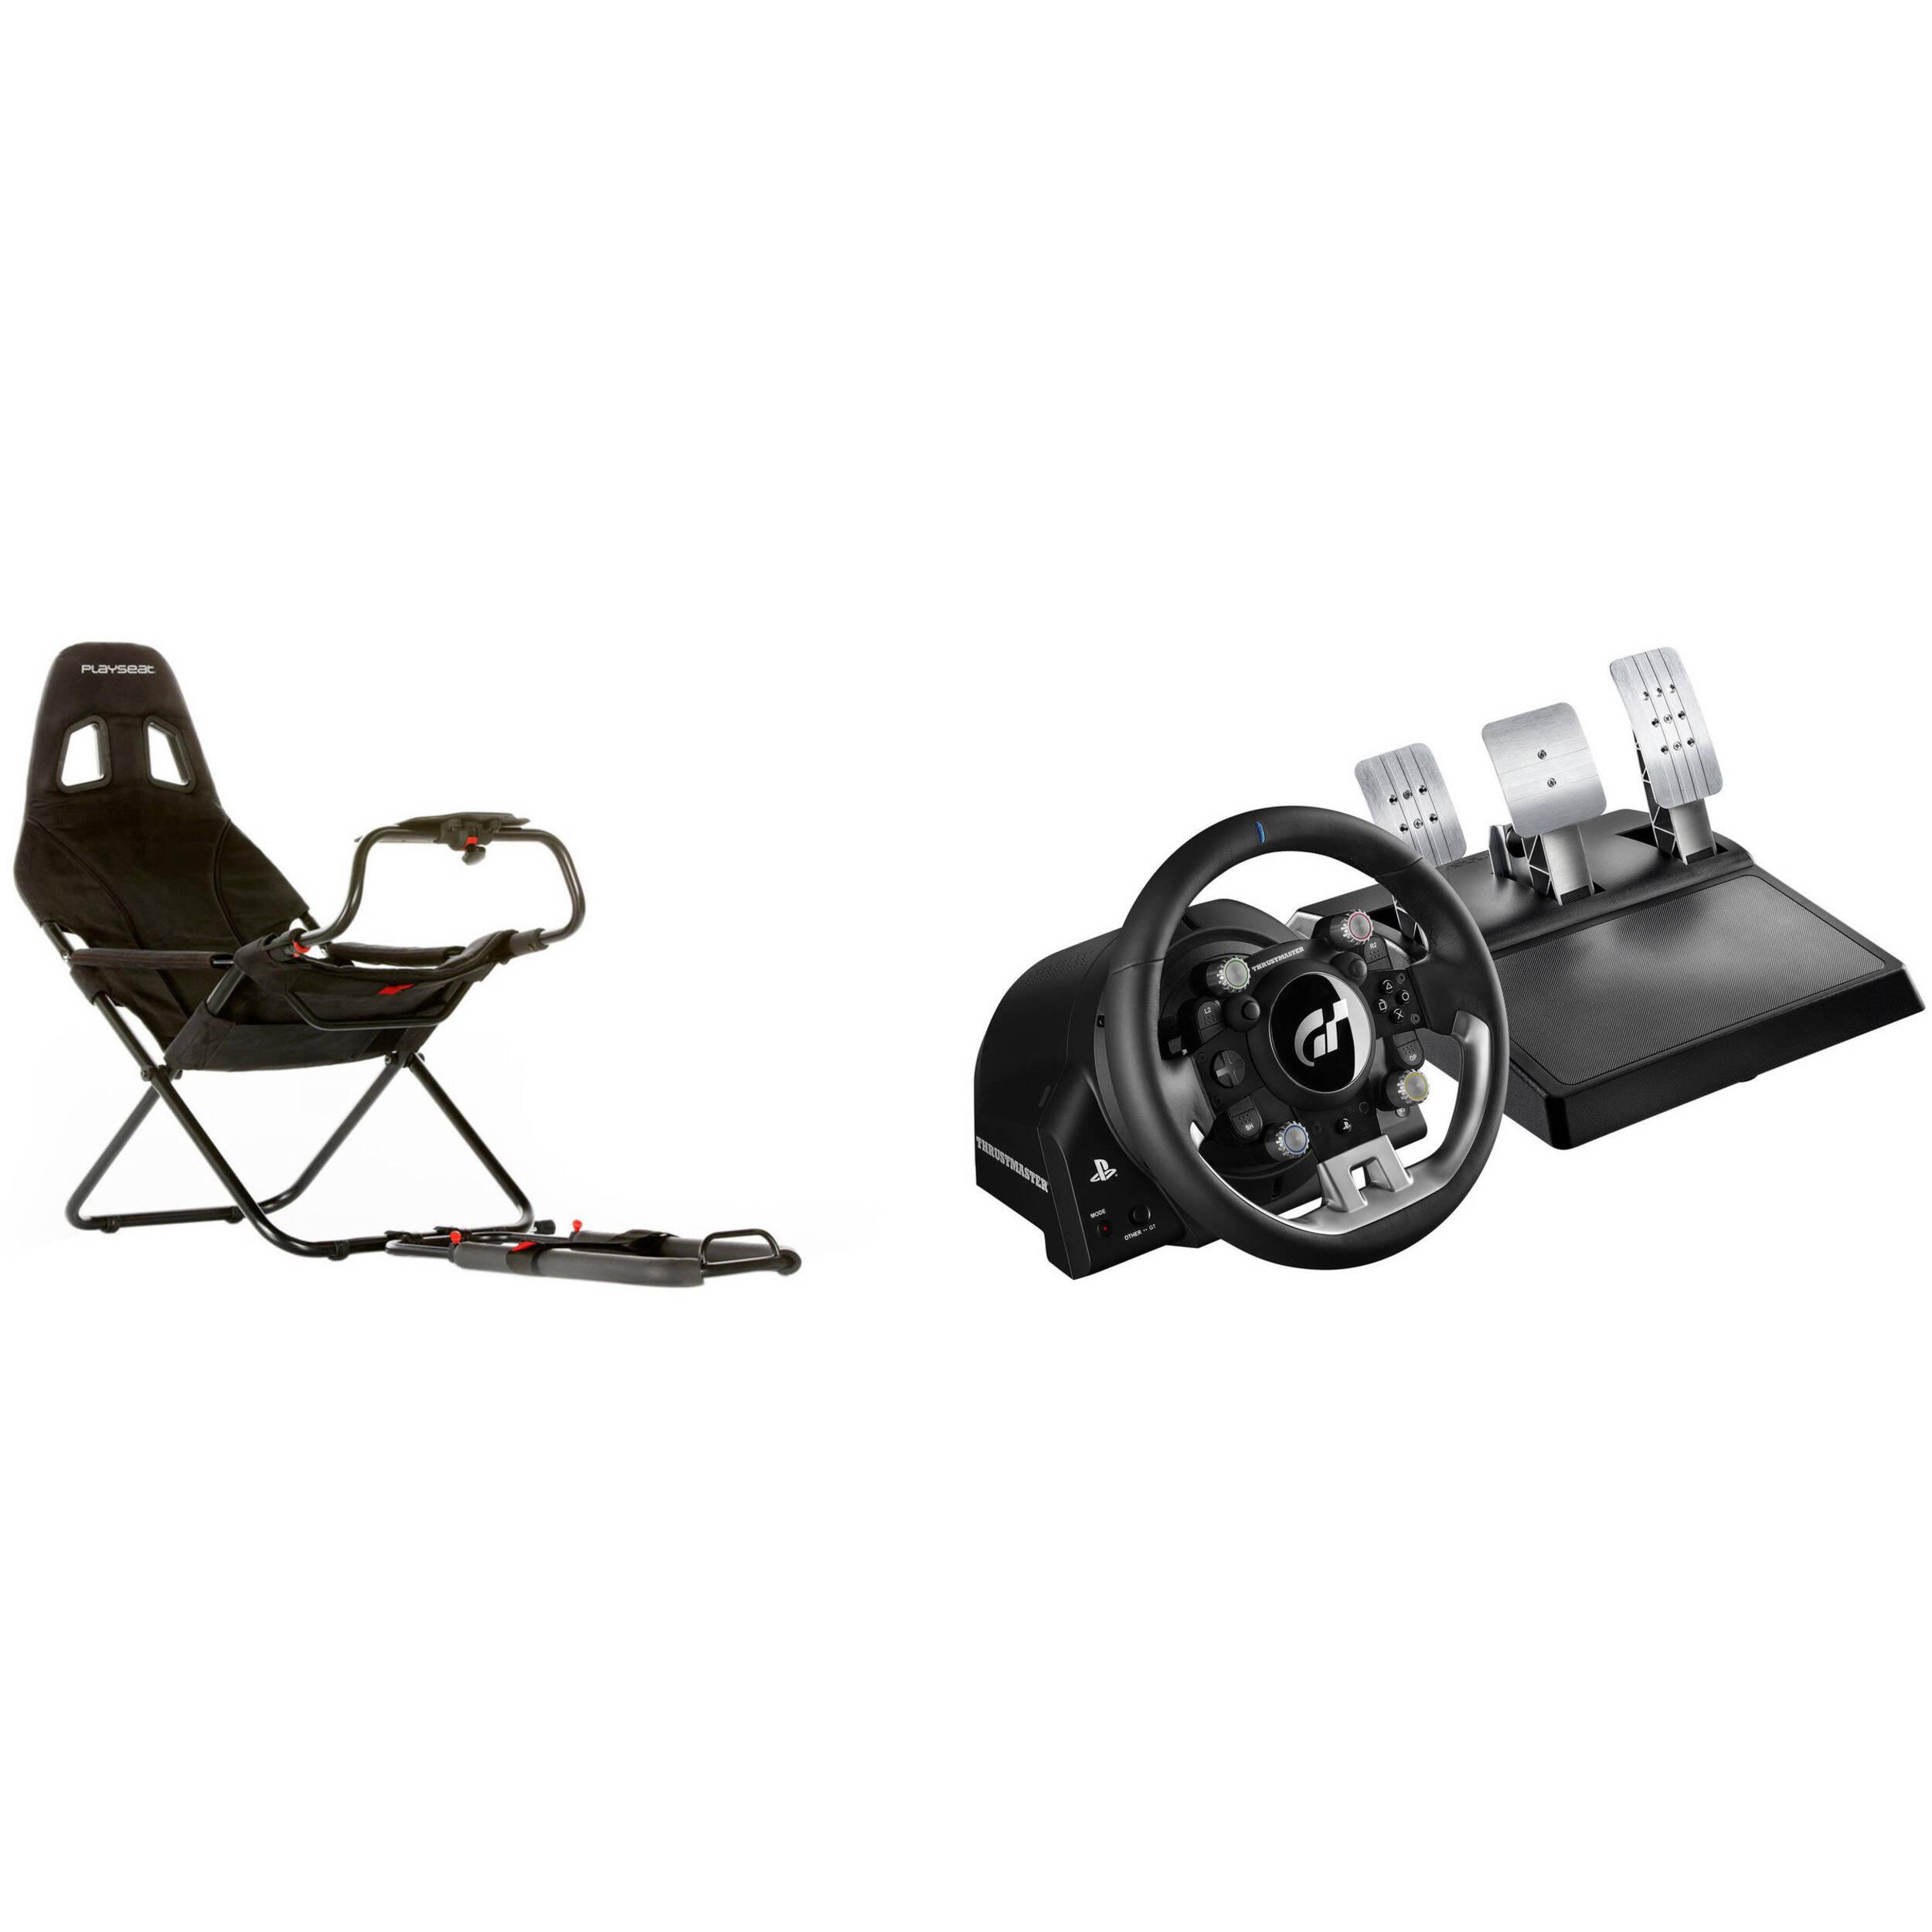 Playseat Challenge Racing Seat & Thrustmaster T-GT Racing Wheel Kit